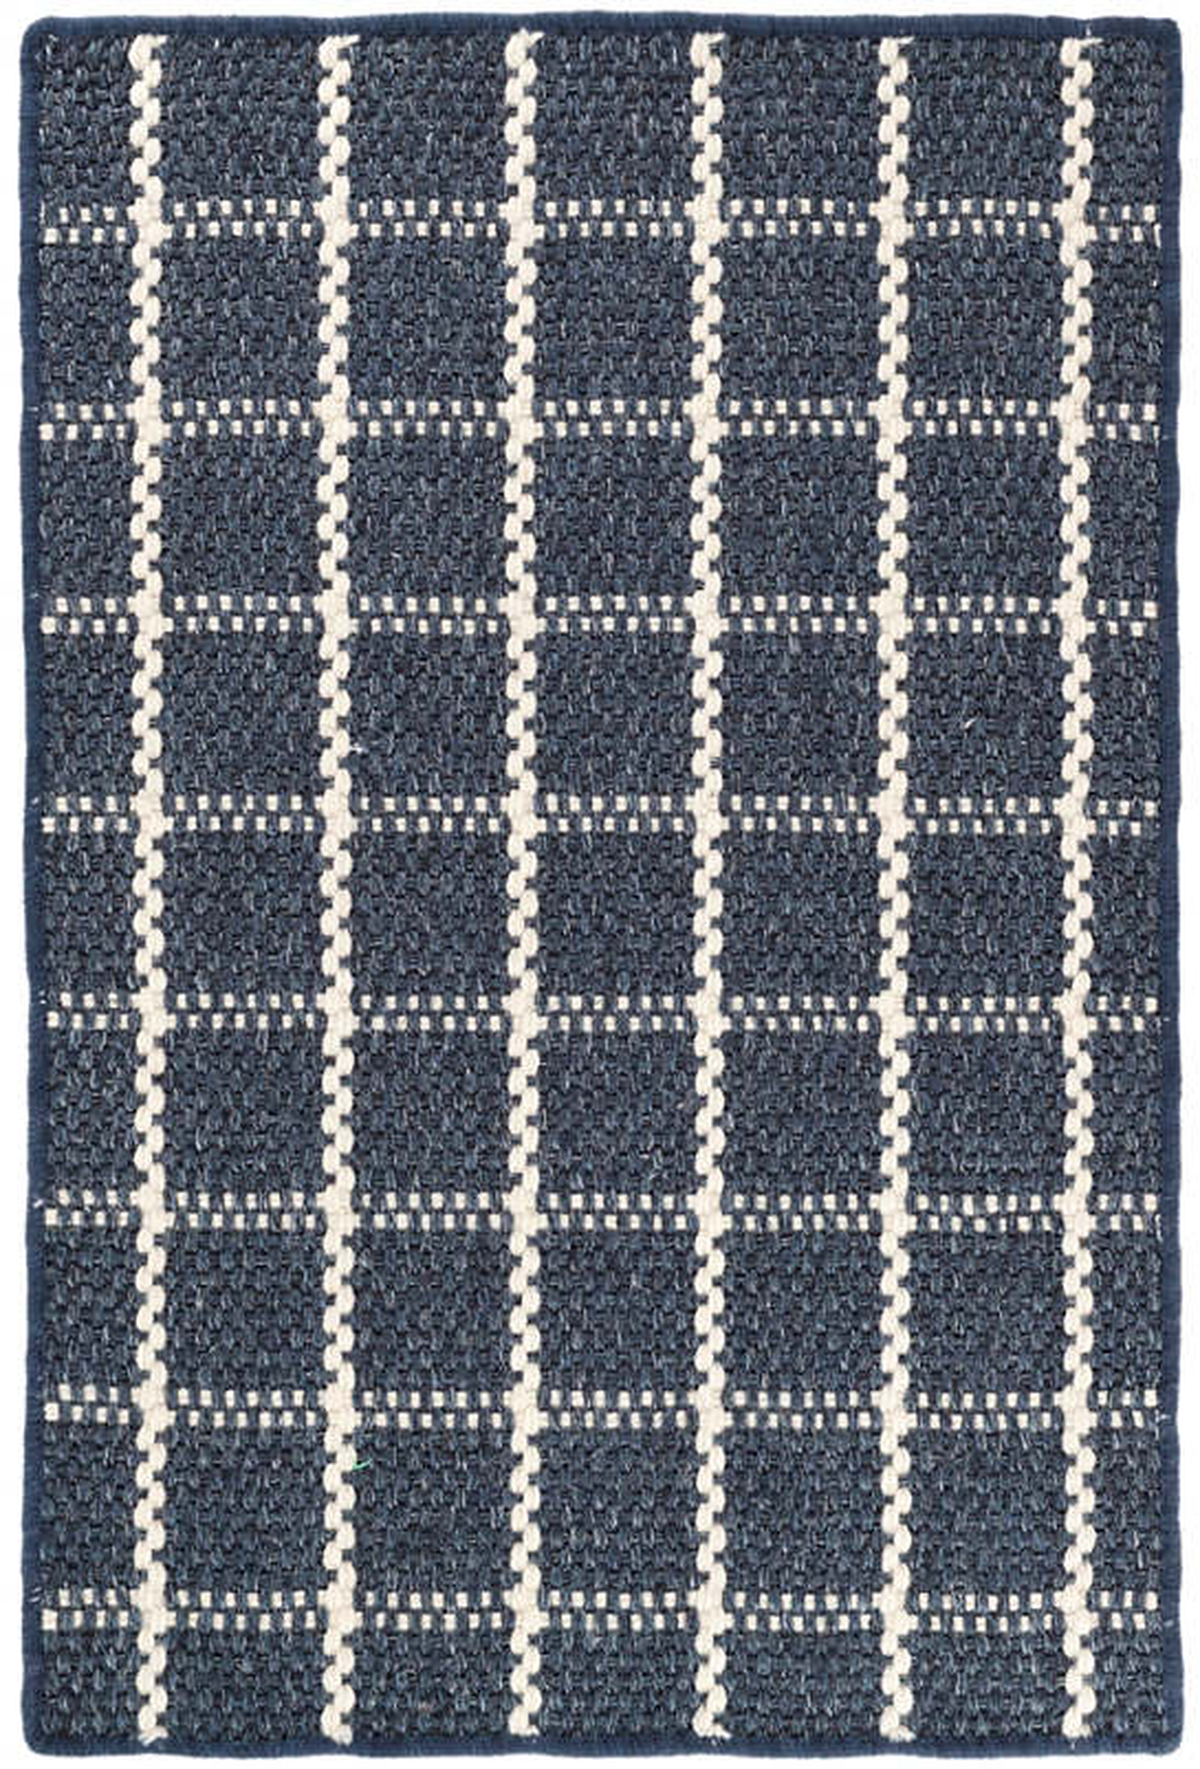 Framework Indigo Woven Sisal Rug